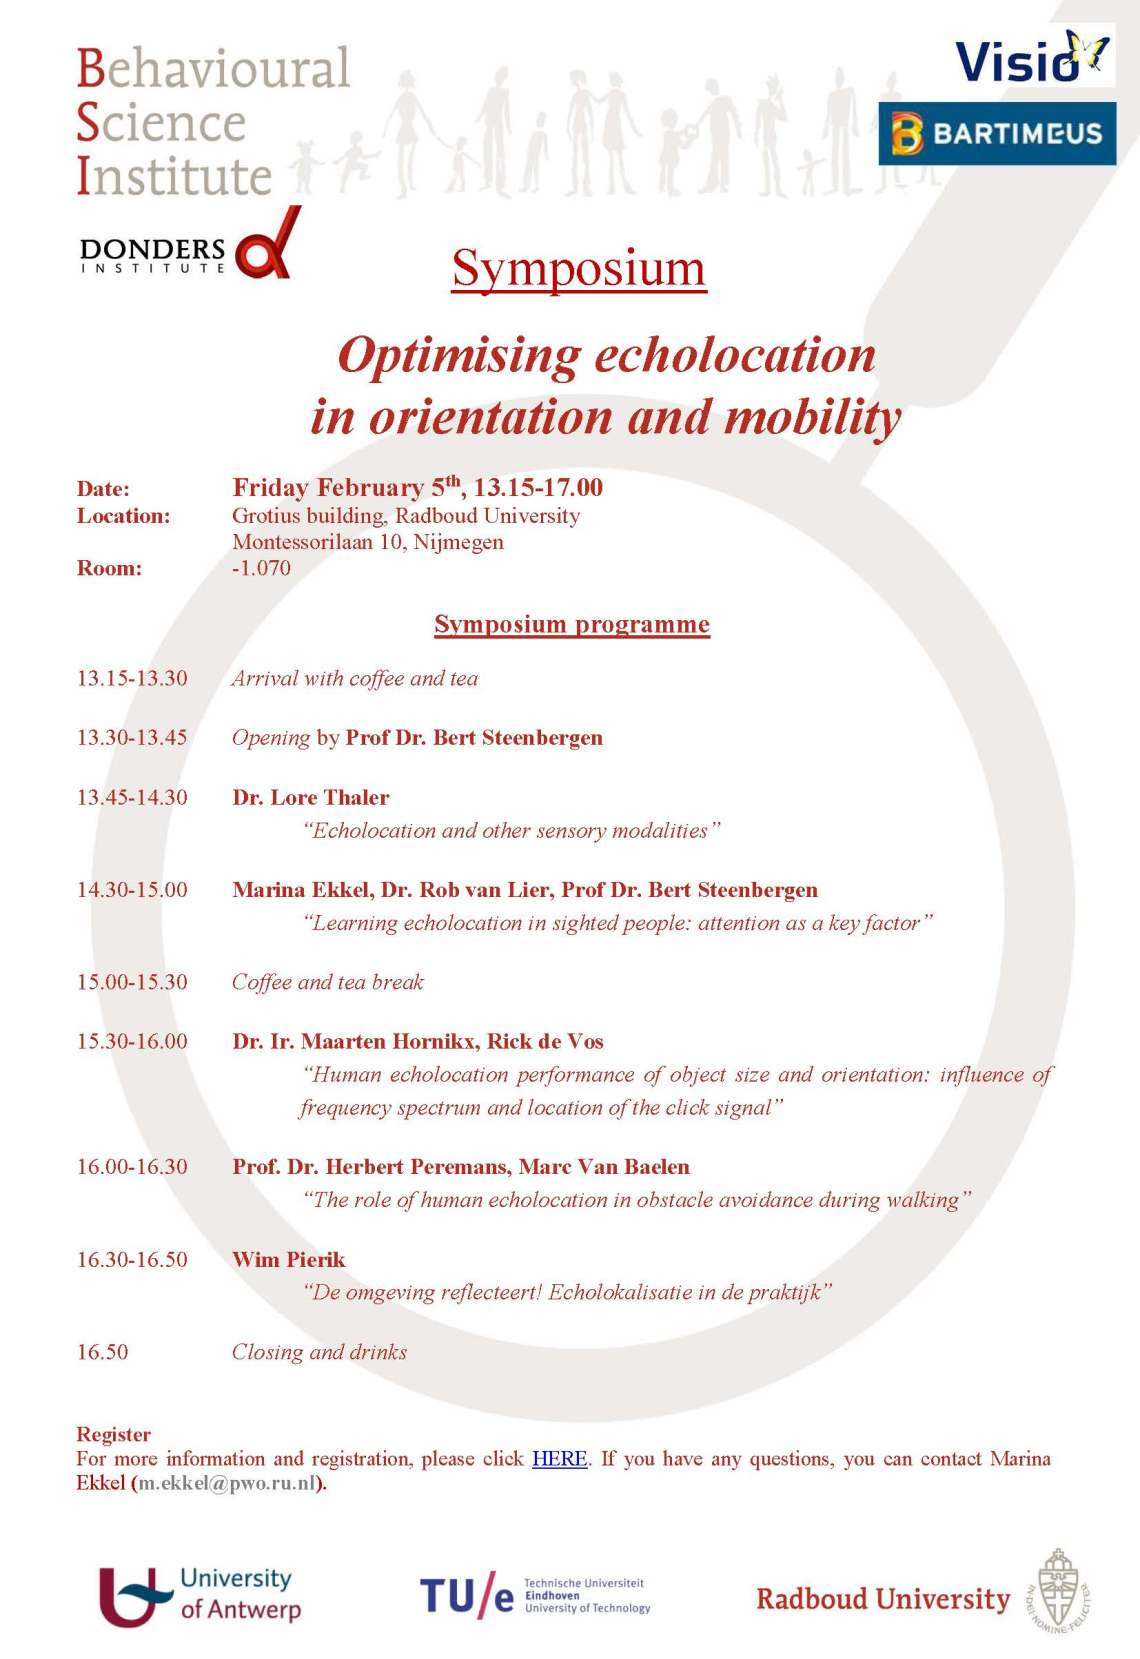 Invitation Symposium Optimising echolocation in orientation and mobility